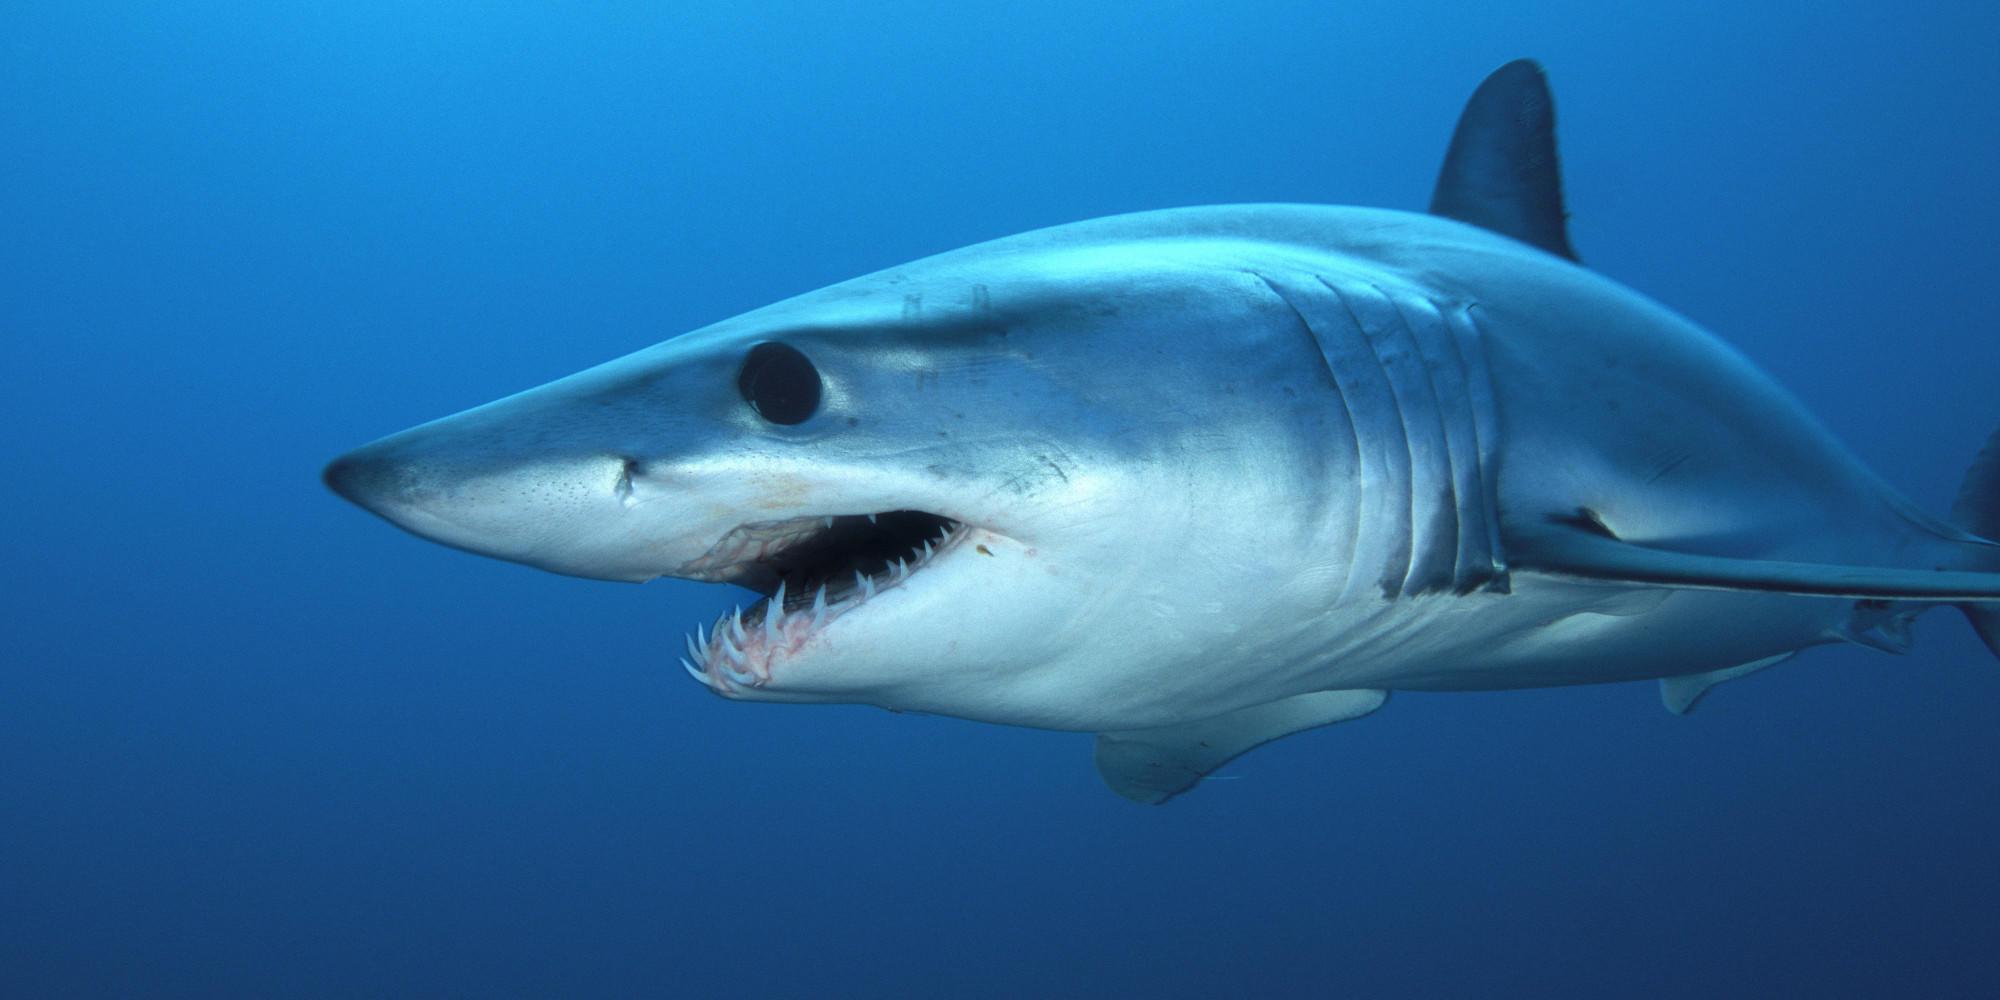 A 300 lb. 8-foot female Short-fin Mako Shark (Isurus oxyrinchus) off the coast of San Diego, California, USA.